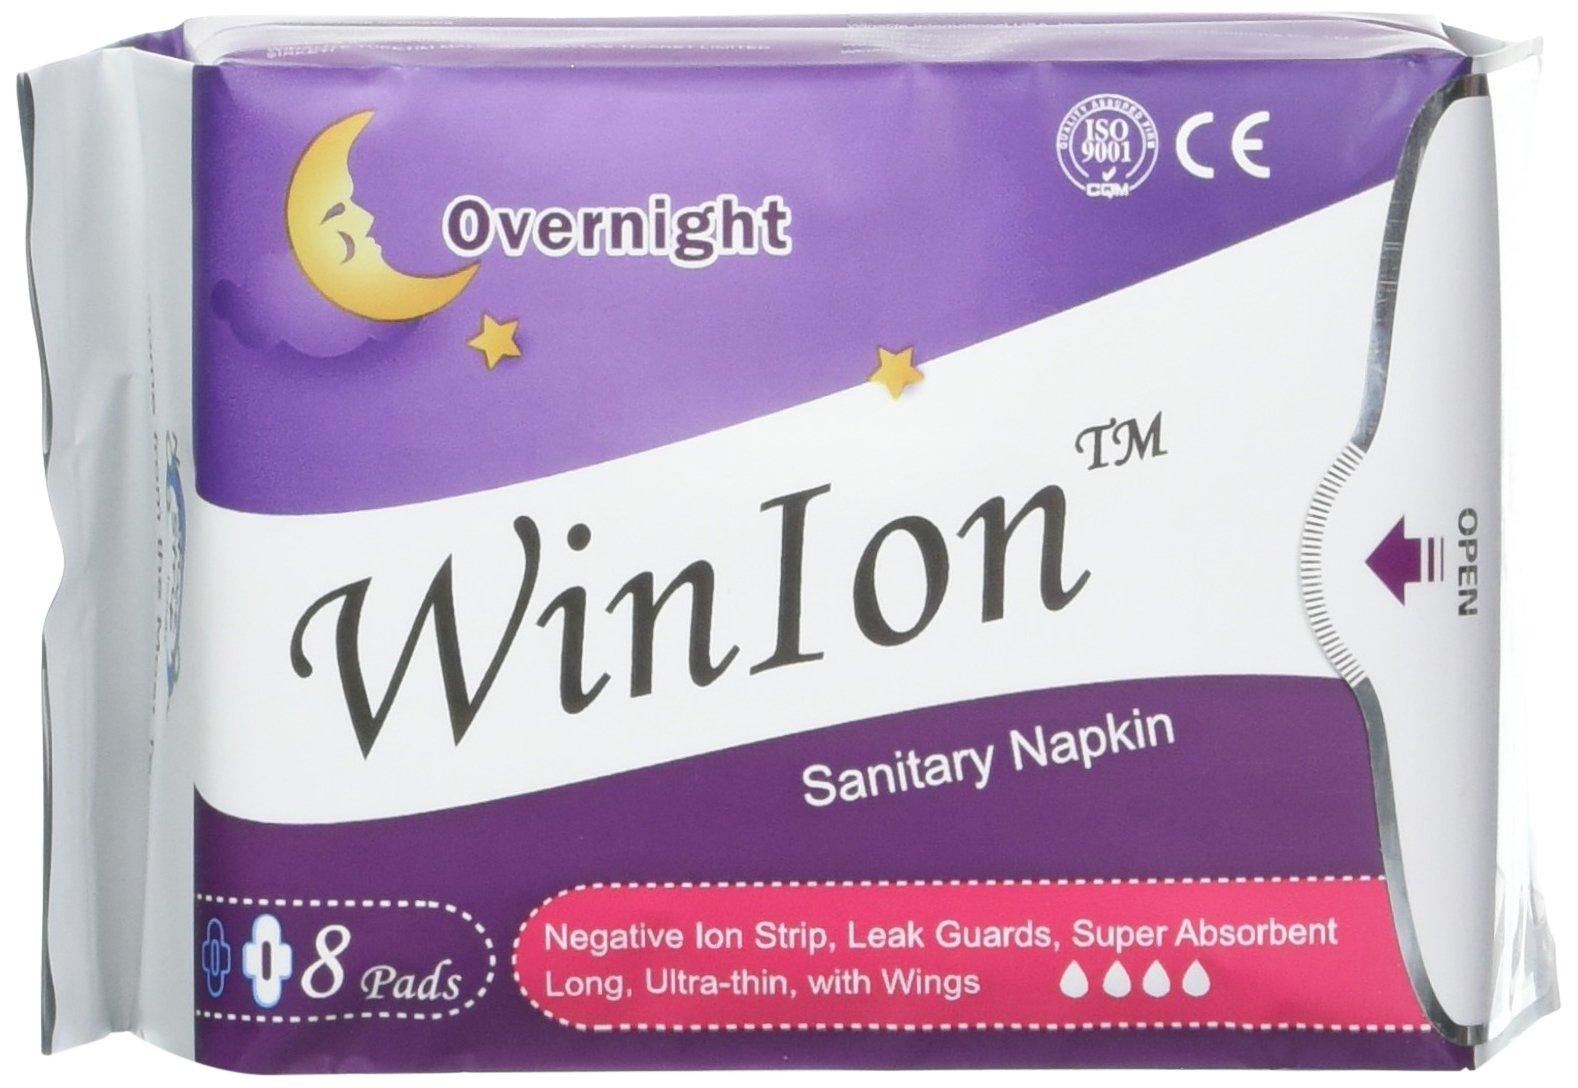 Anion Sanitary Napkin 10 Day, 4 Overnight, 5 Pantiliner Packs 232 Pads